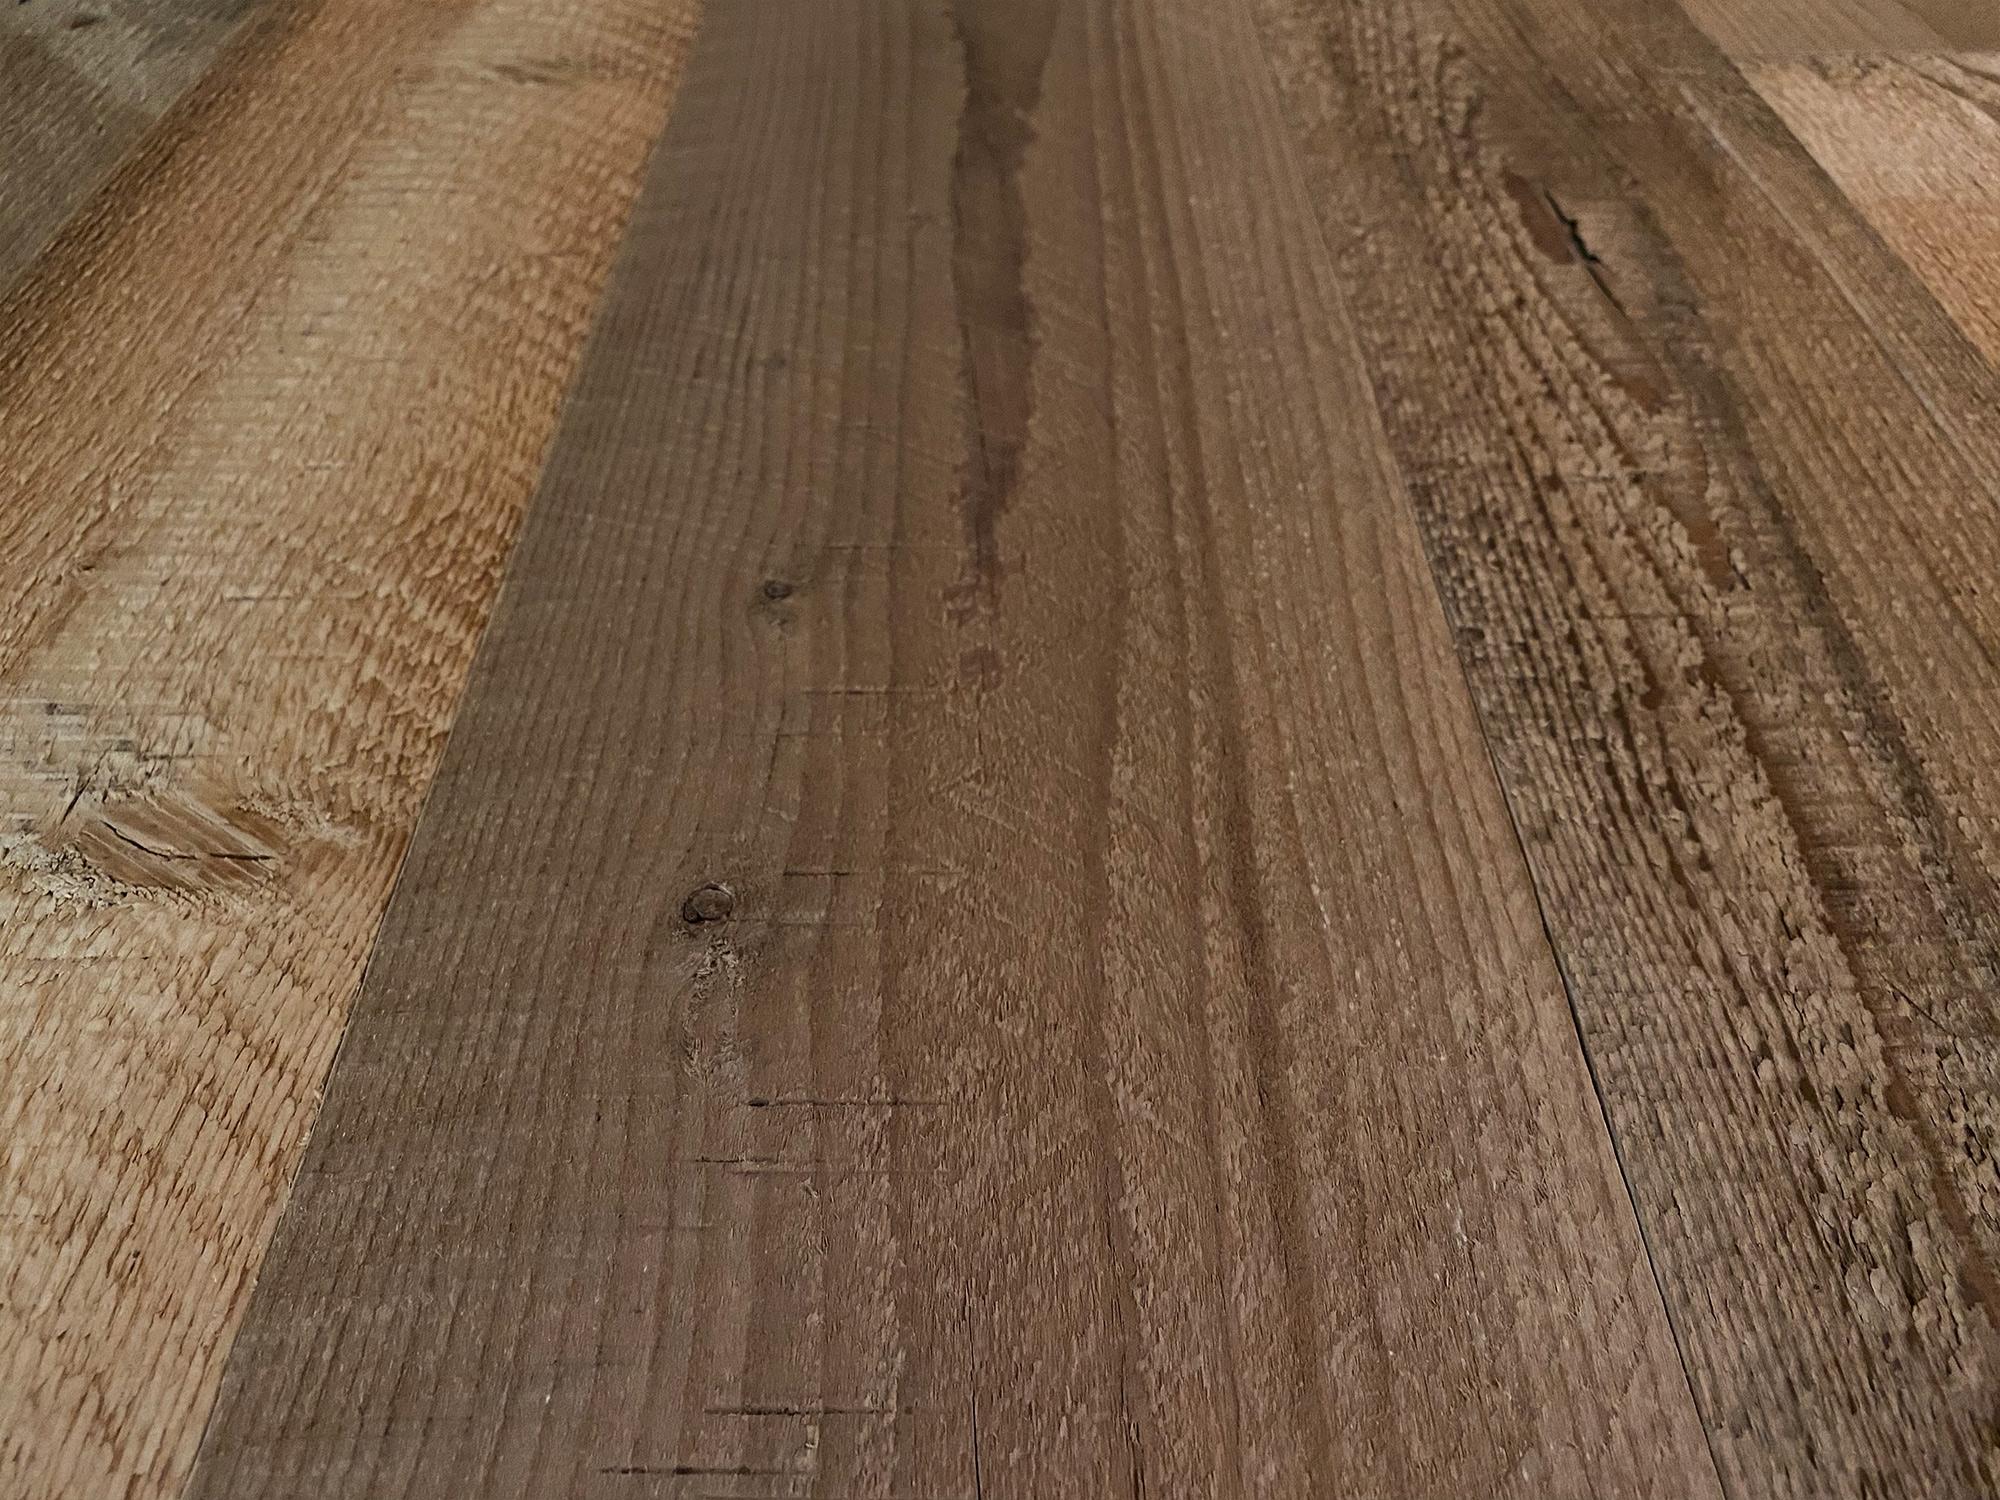 Ligh brown wood pine cladding